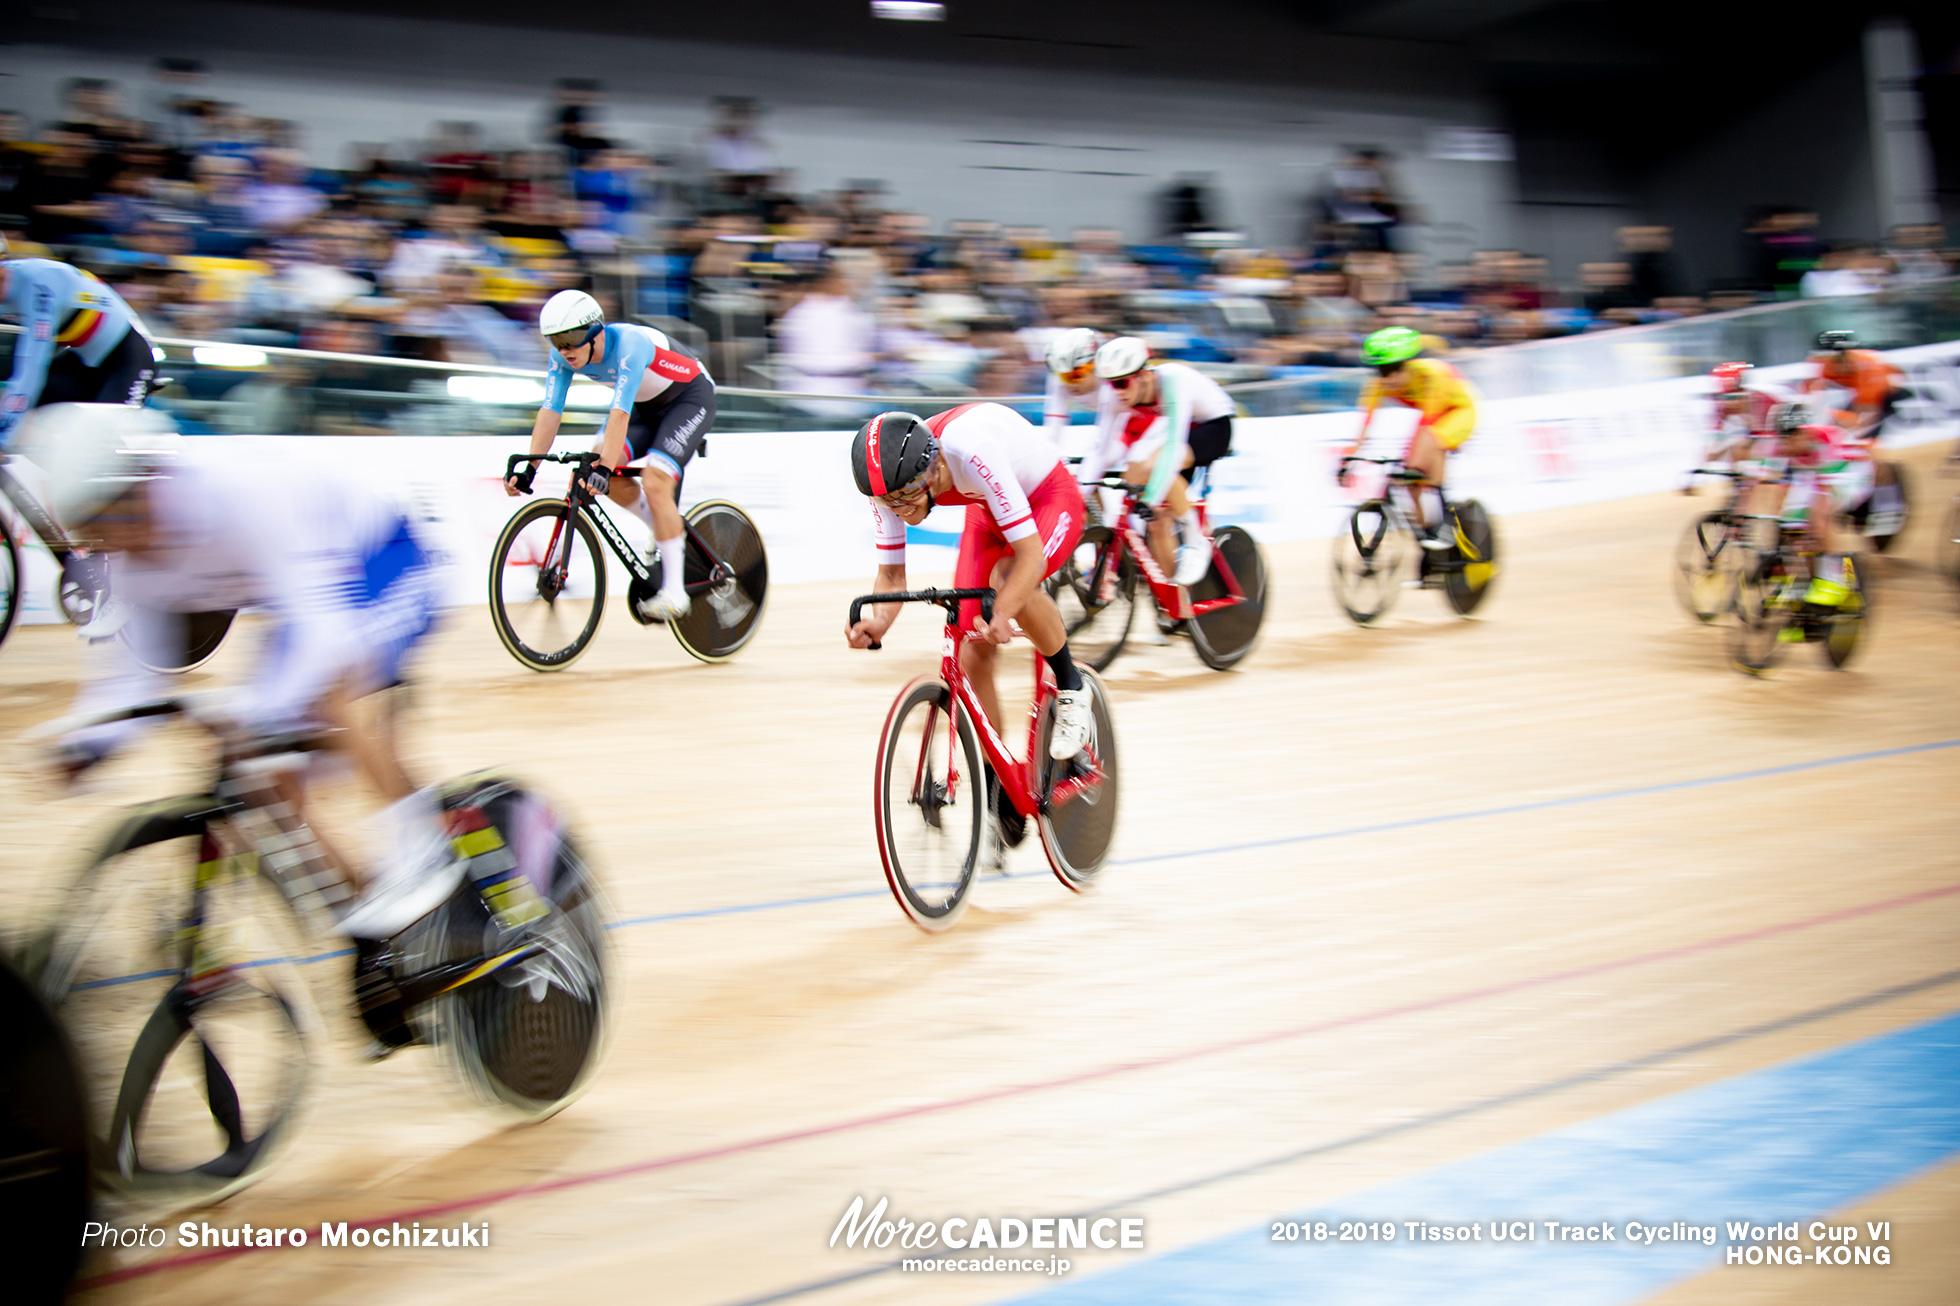 Tempo Race / Men's Omnium / Track Cycling World Cup VI / Hong-Kong